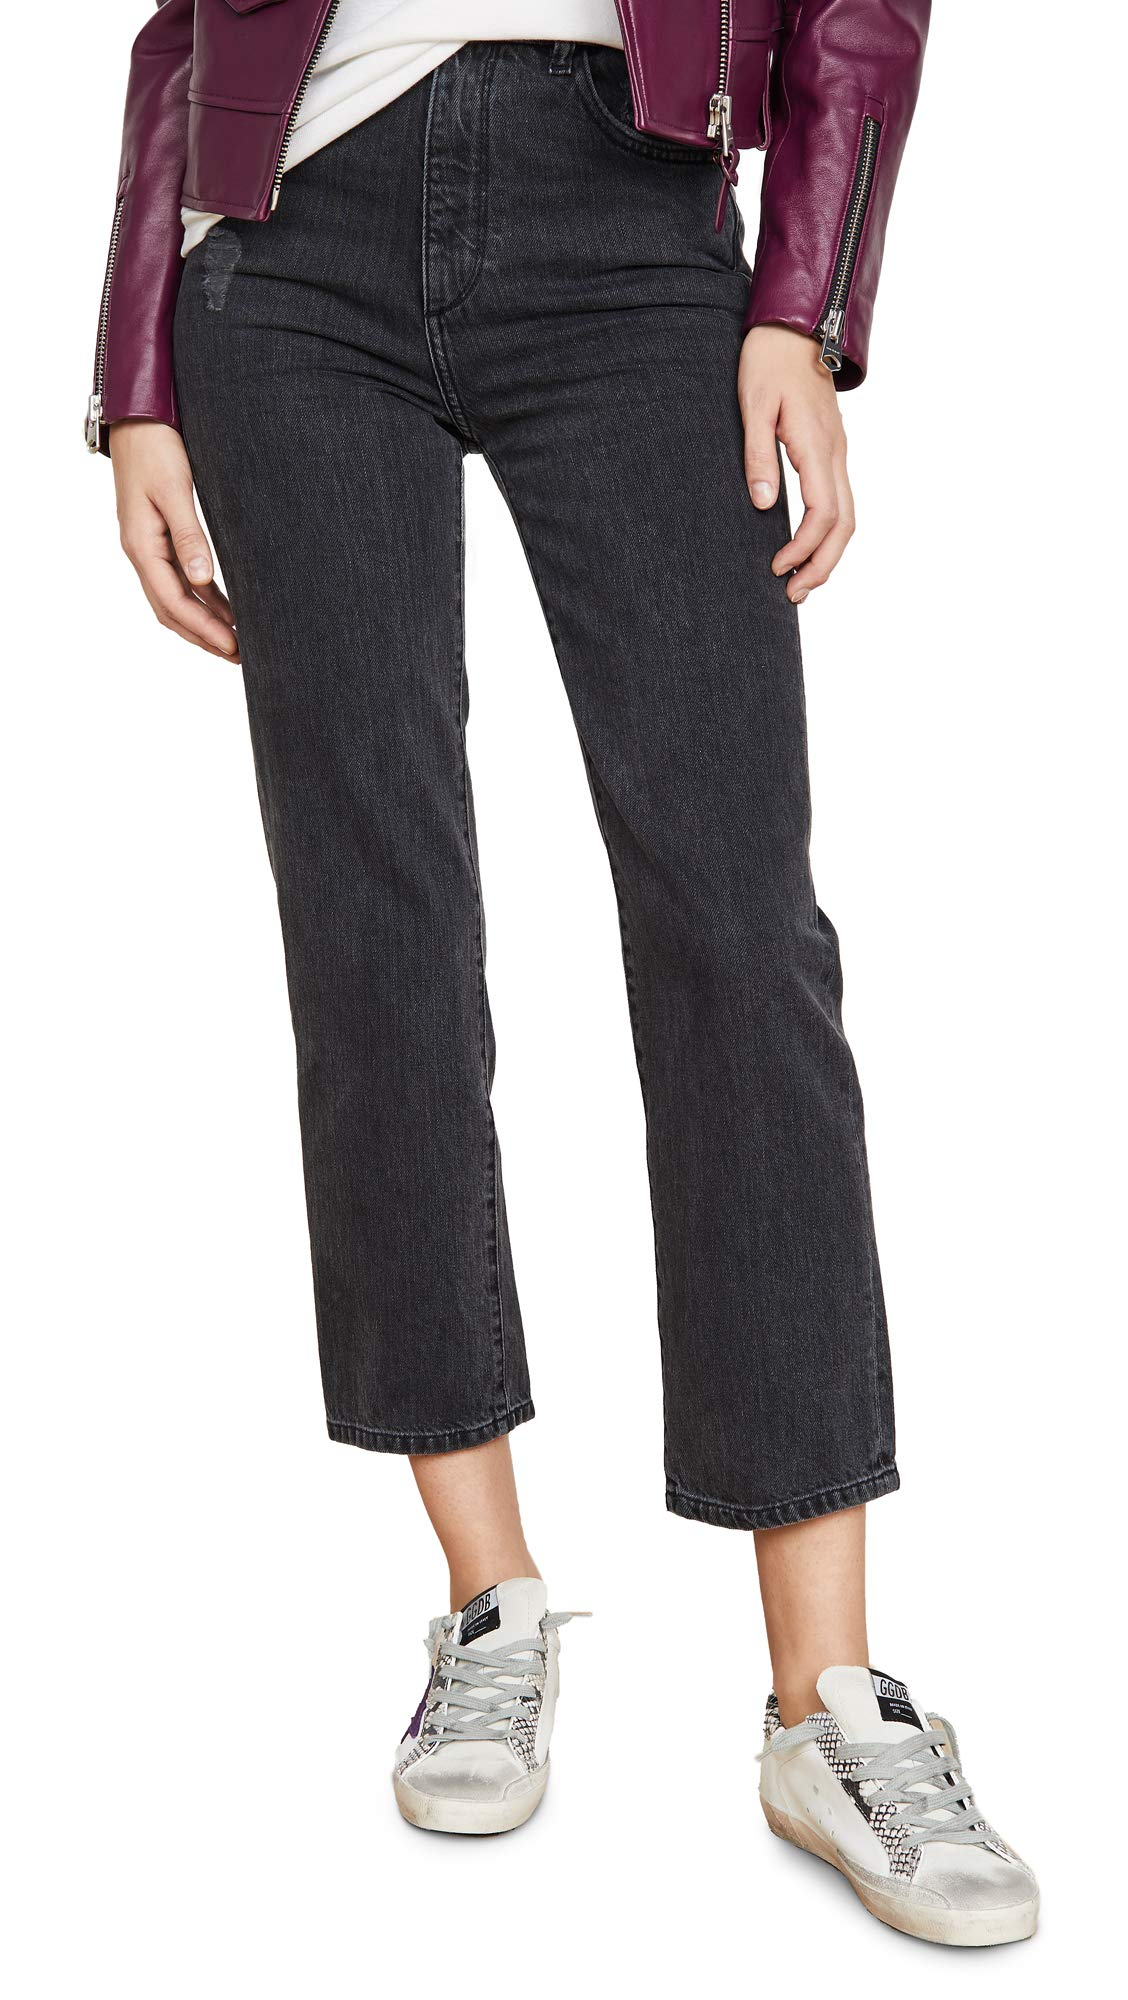 DL1961 Women's x Marianna Hewitt Jerry High Rise Vintage Straight Jeans